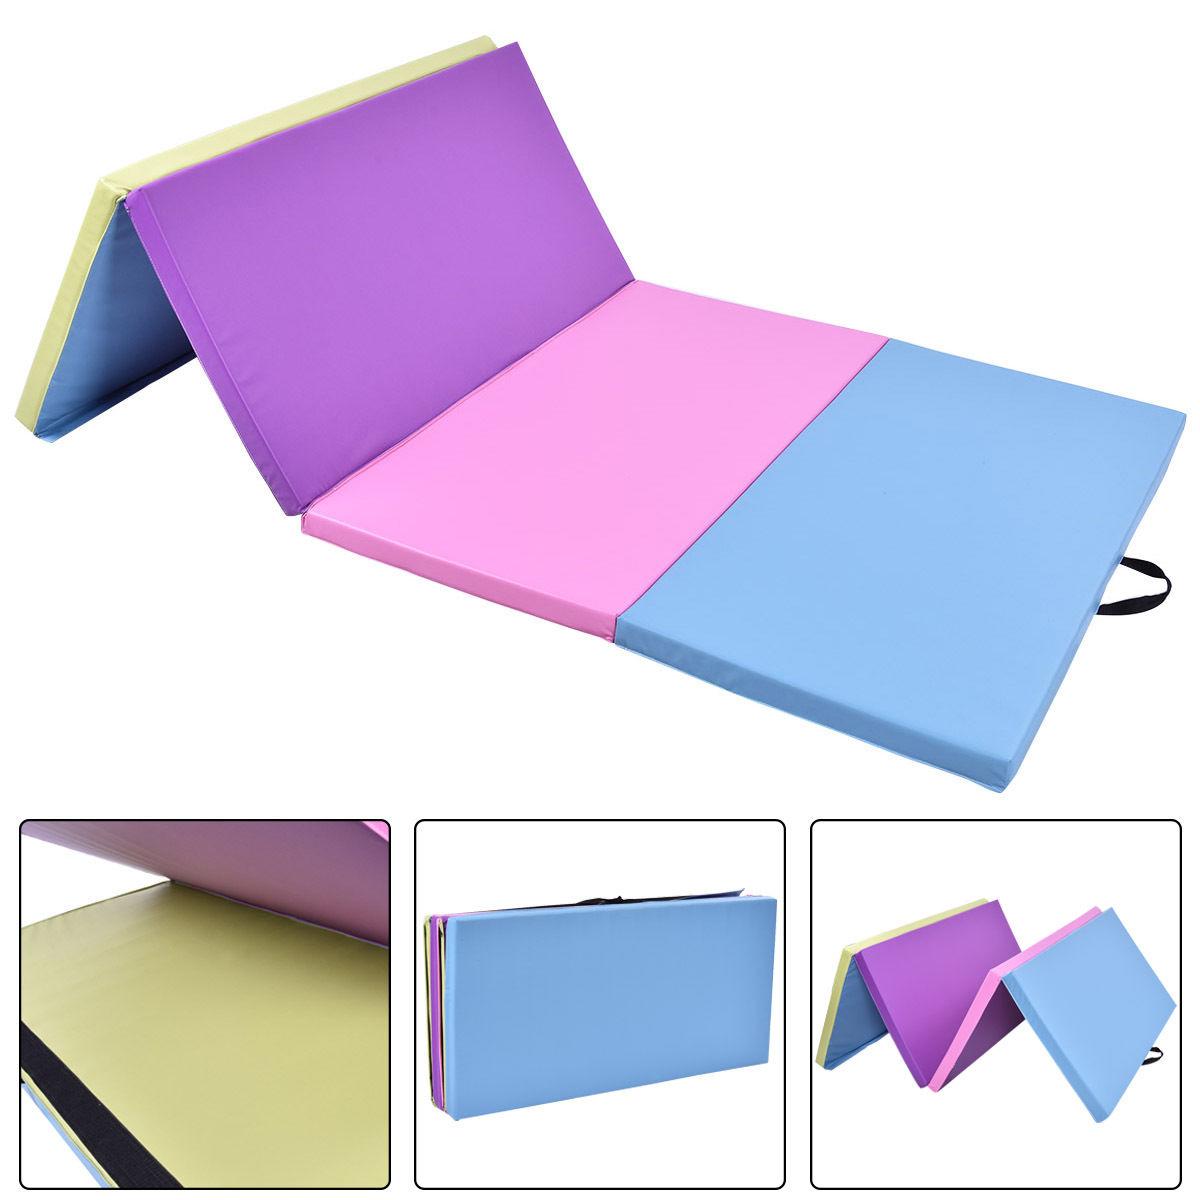 Costway Costway 4 X8 X2 Gymnastics Mat Folding Pu Panel